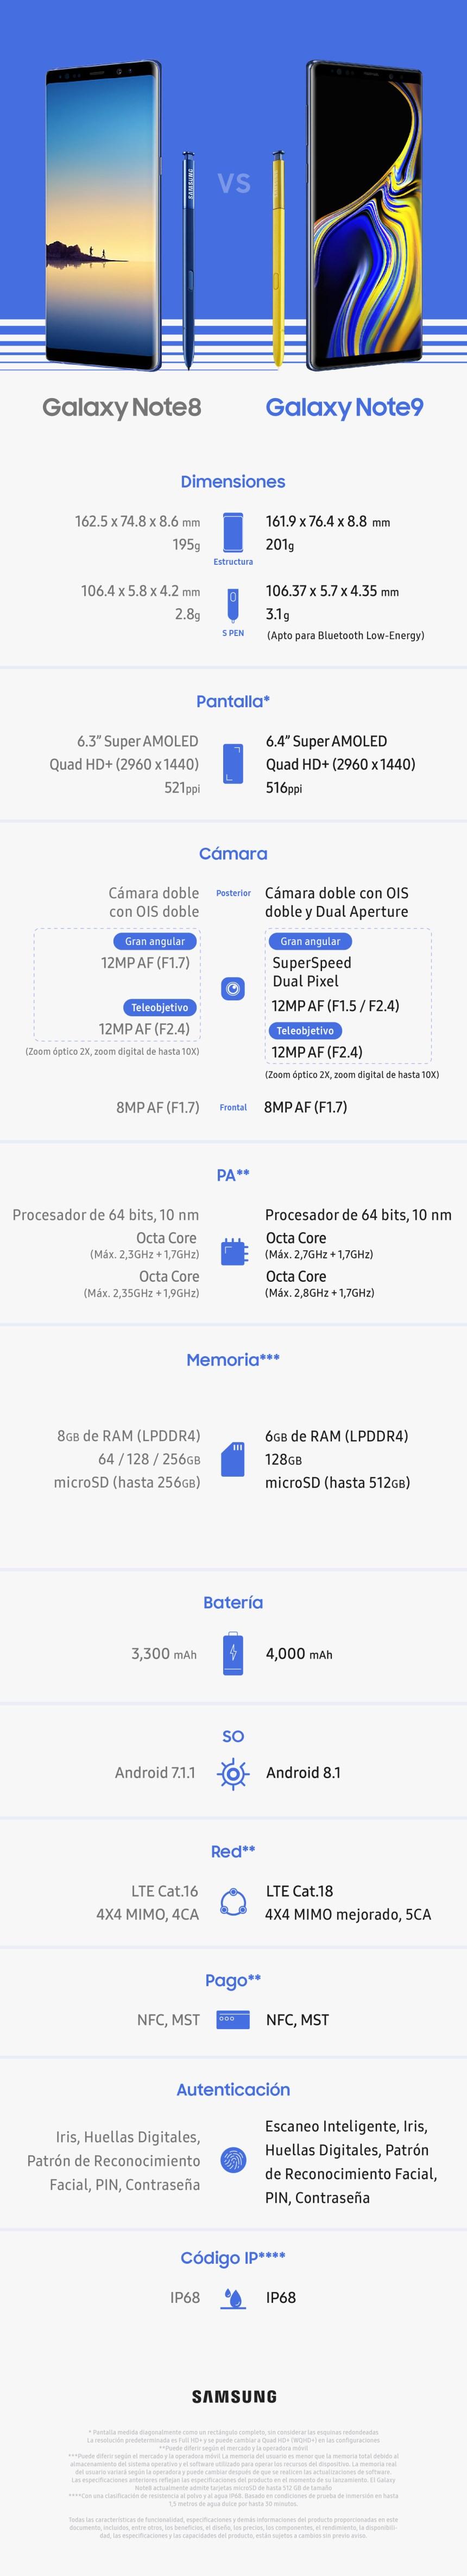 Samsung Galaxy Note 9 vs Note 8